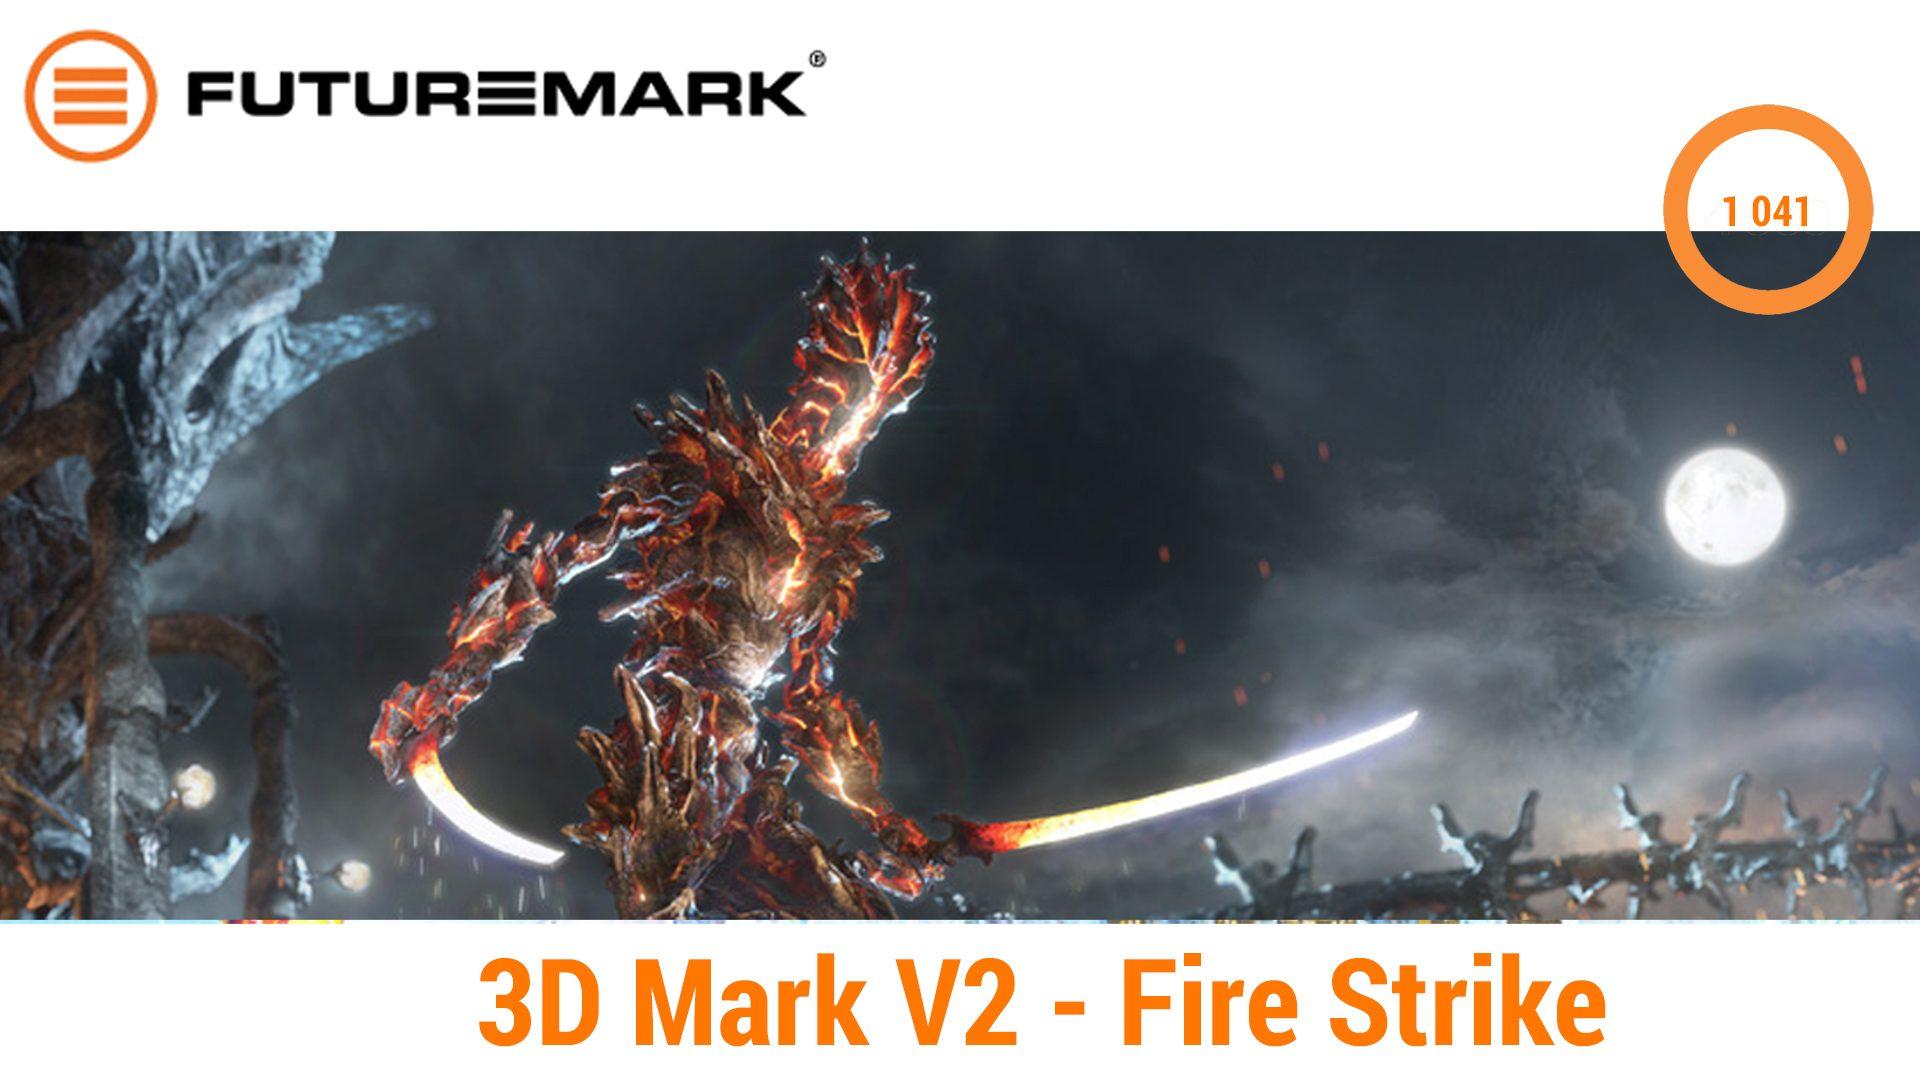 HP-Spectre-x360-15-ap006ng-3D-Mark-V2—Fire-Strike-2